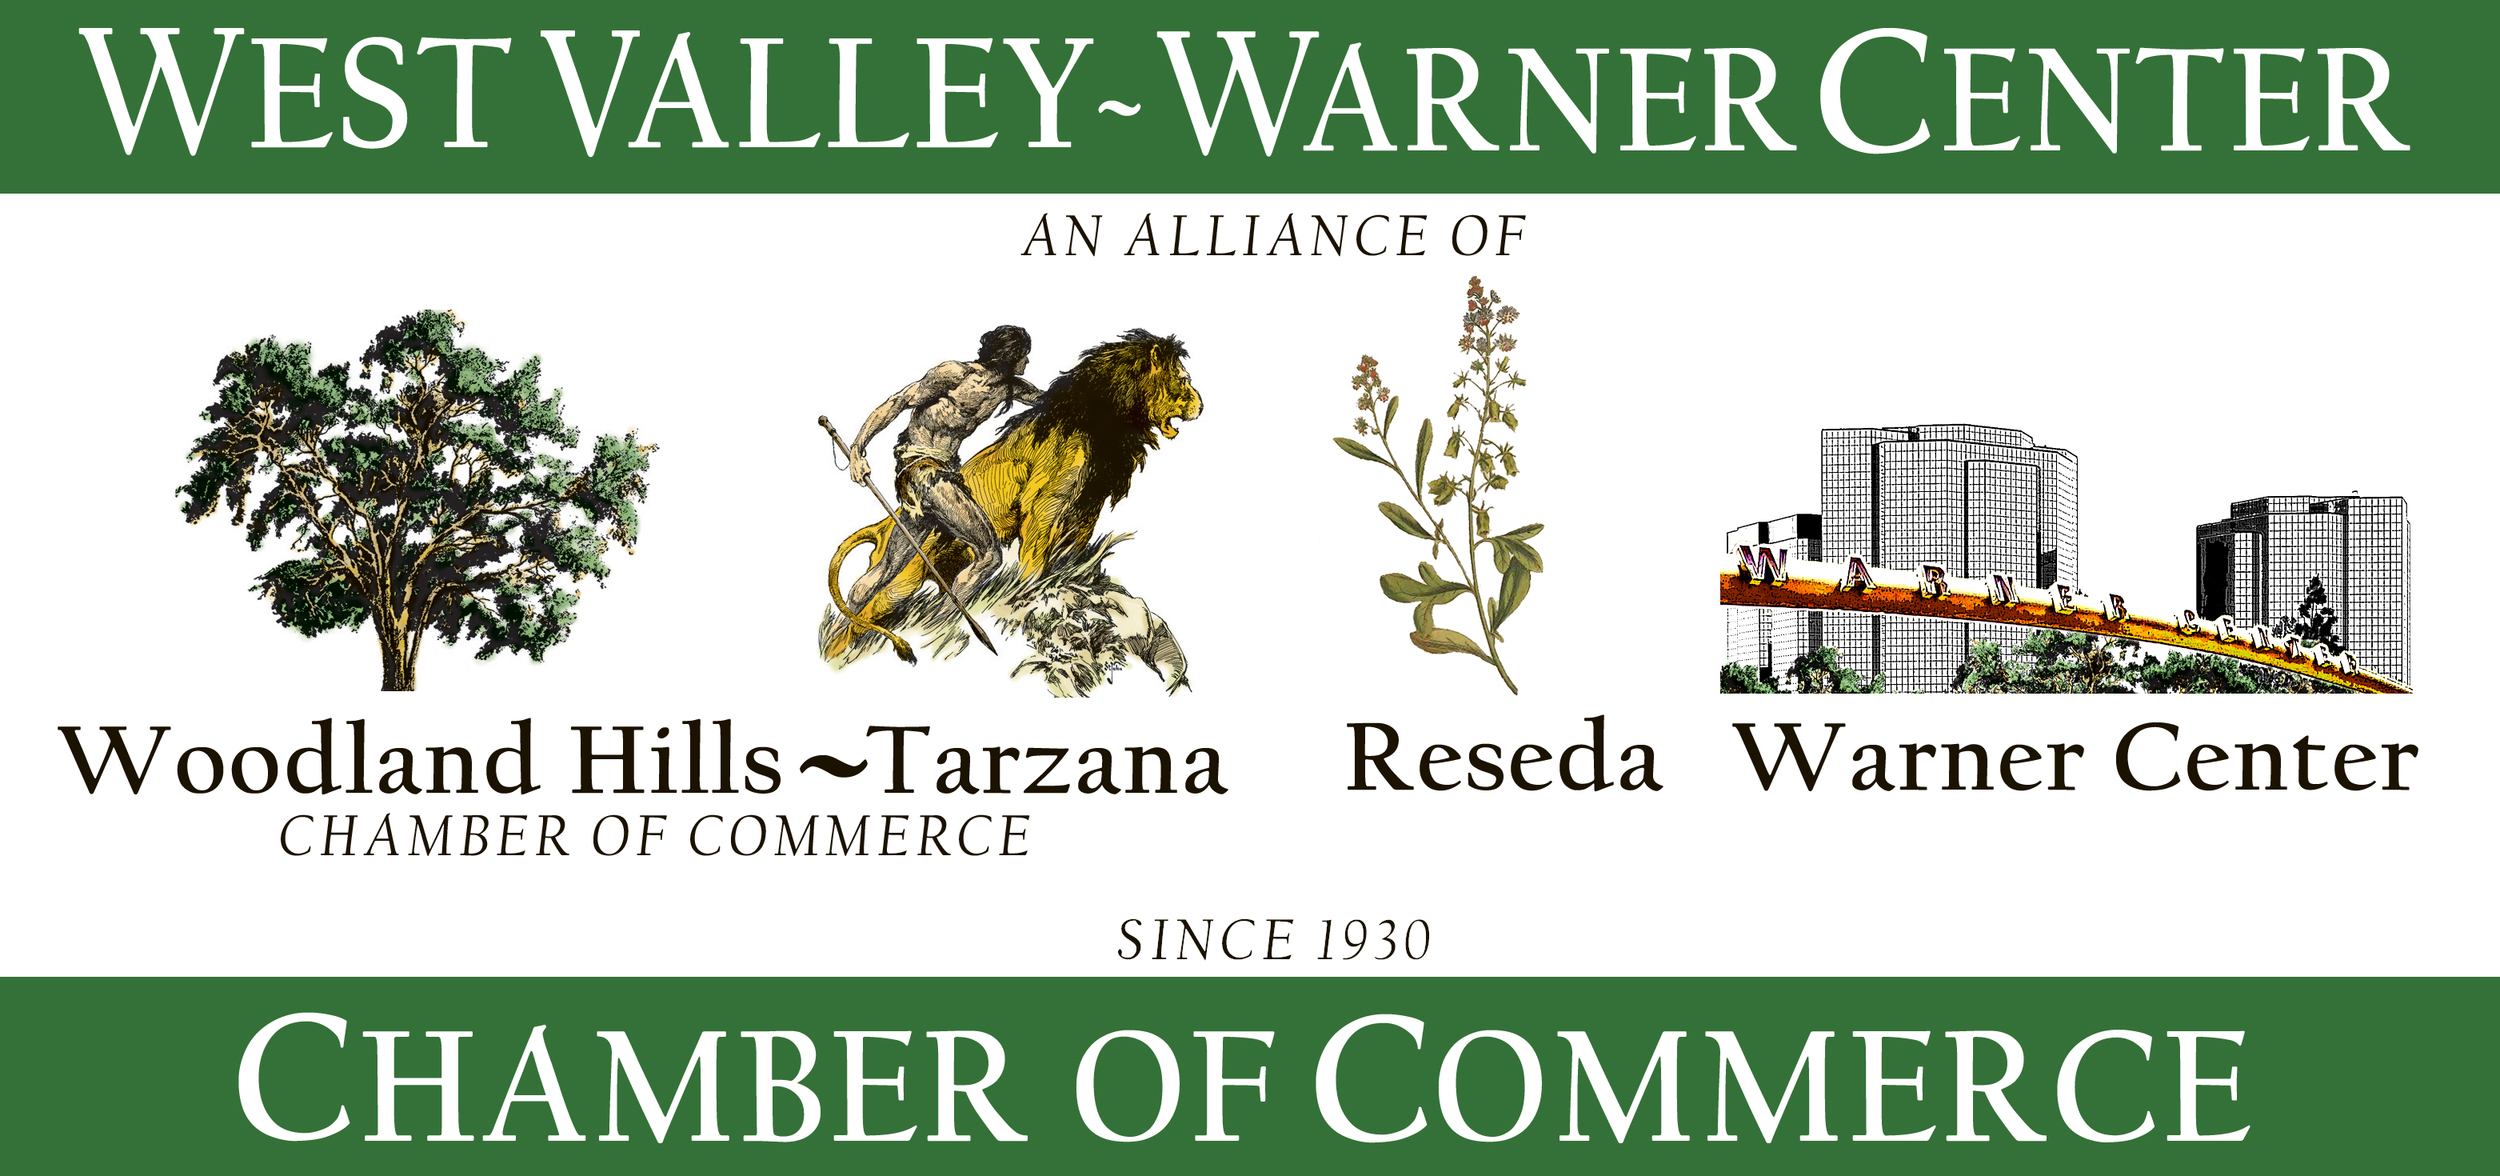 Copy of west valley warner center cc.jpg